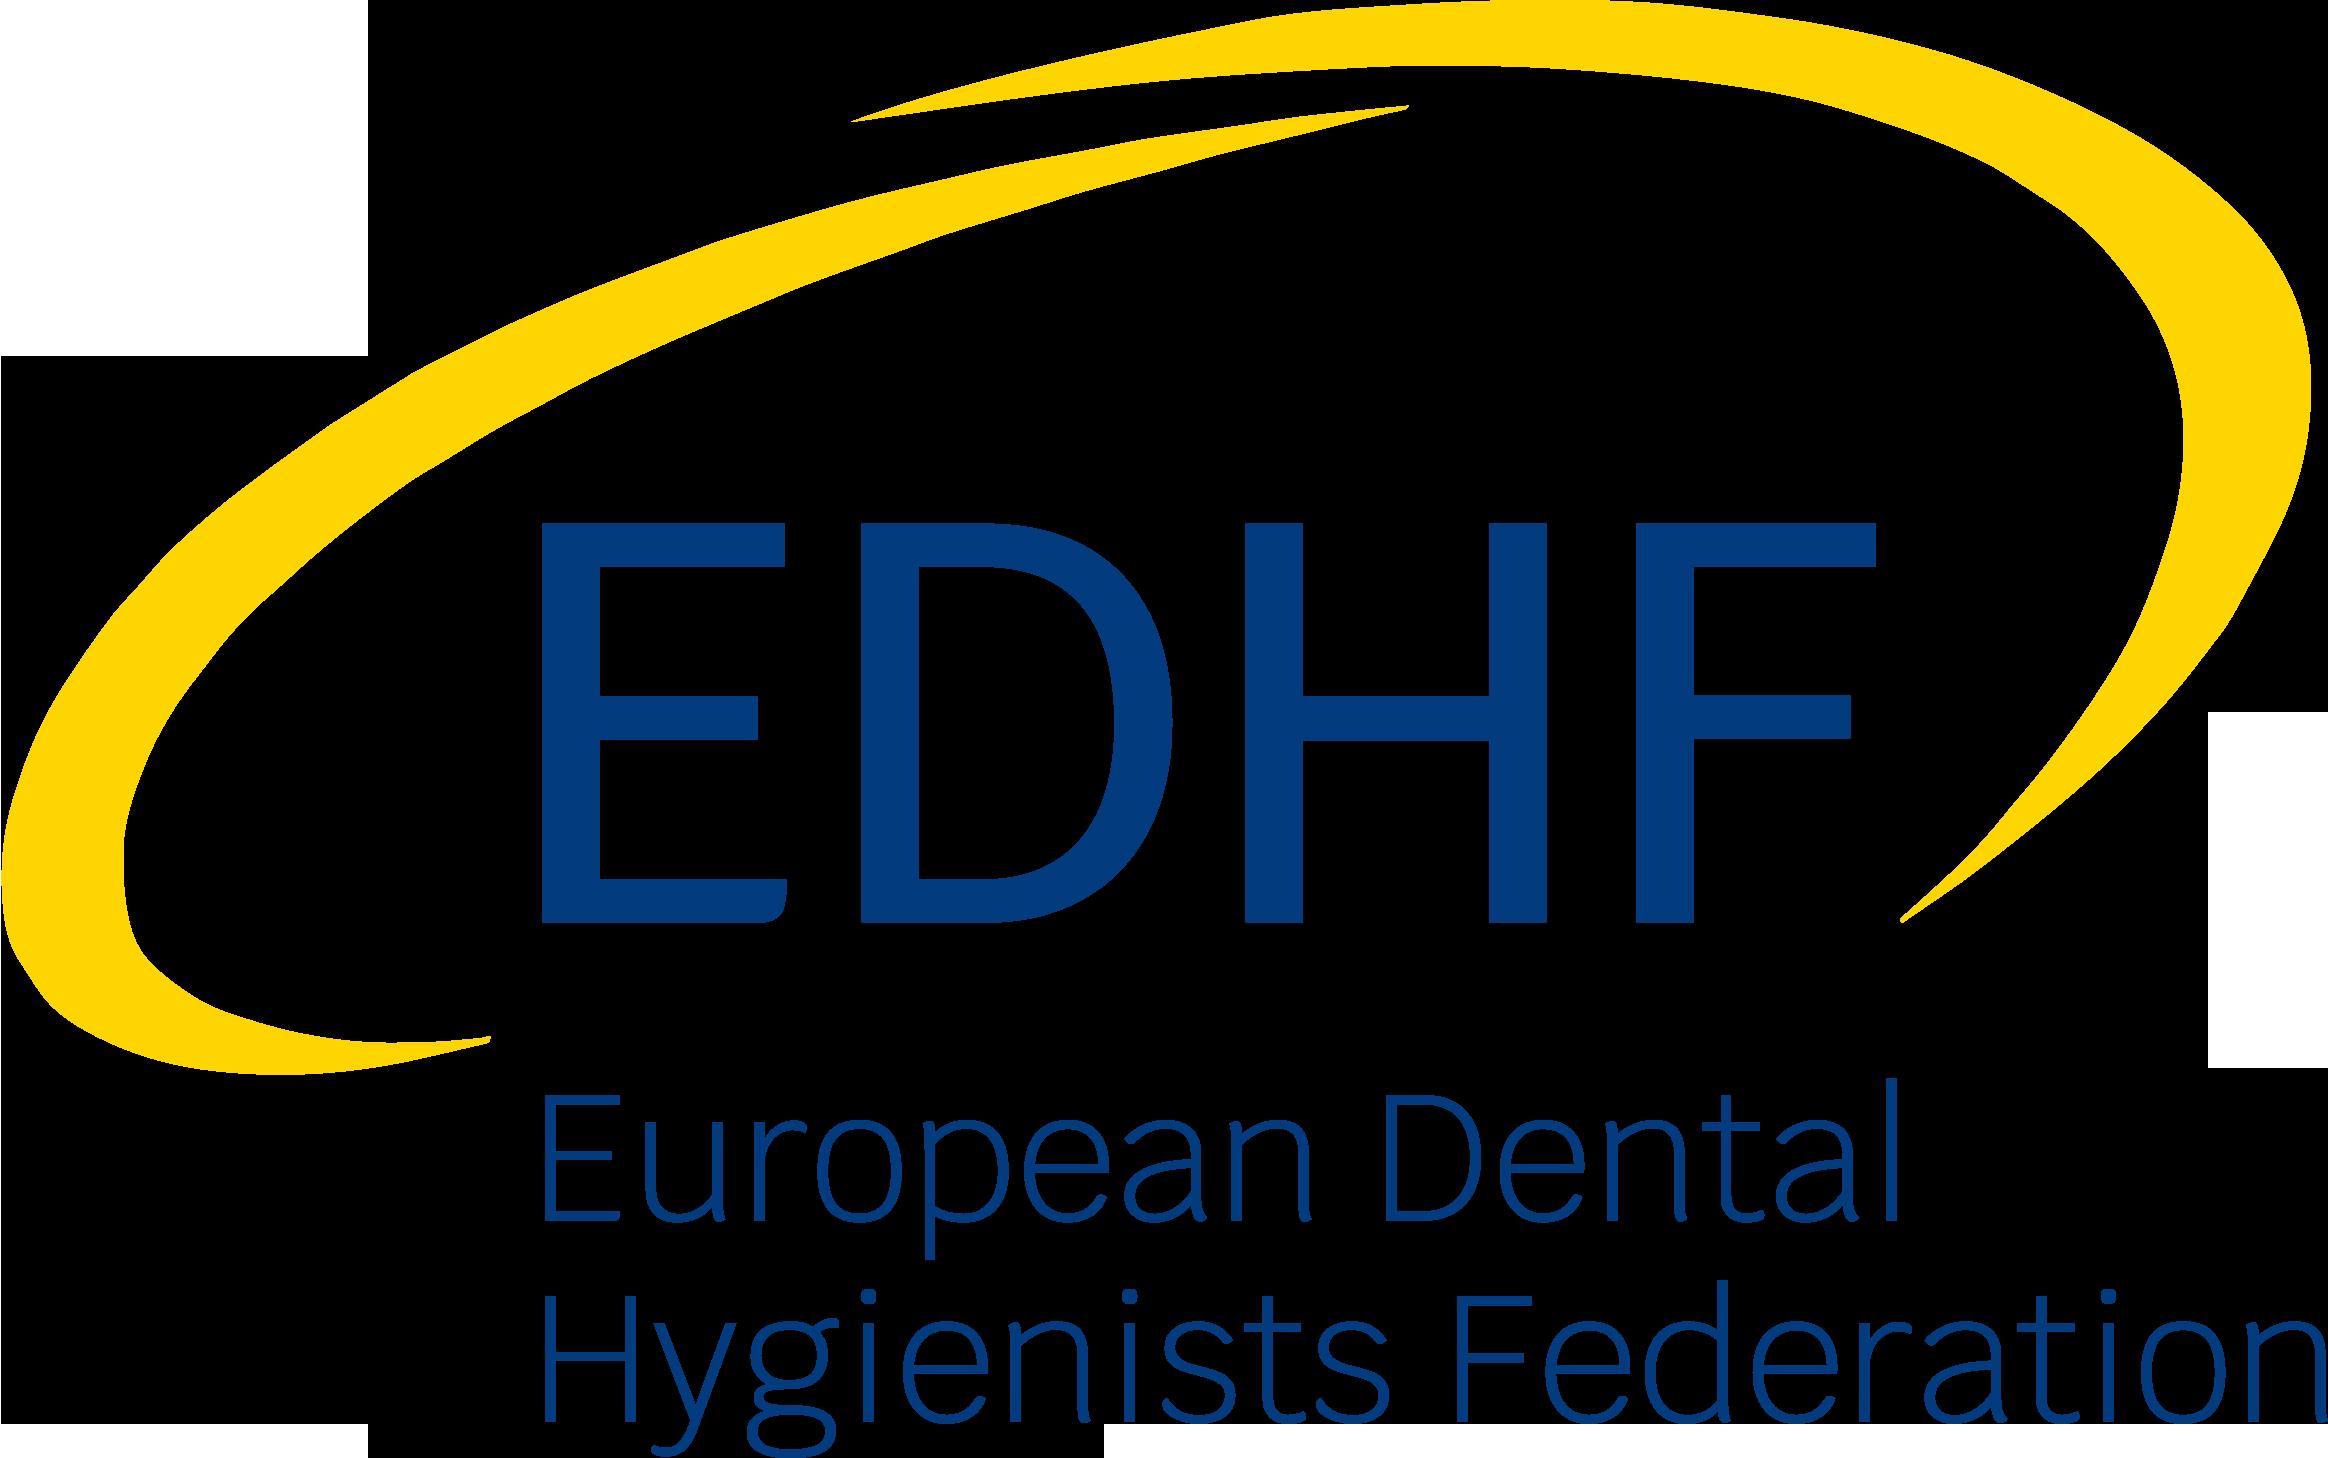 EDHF_logo